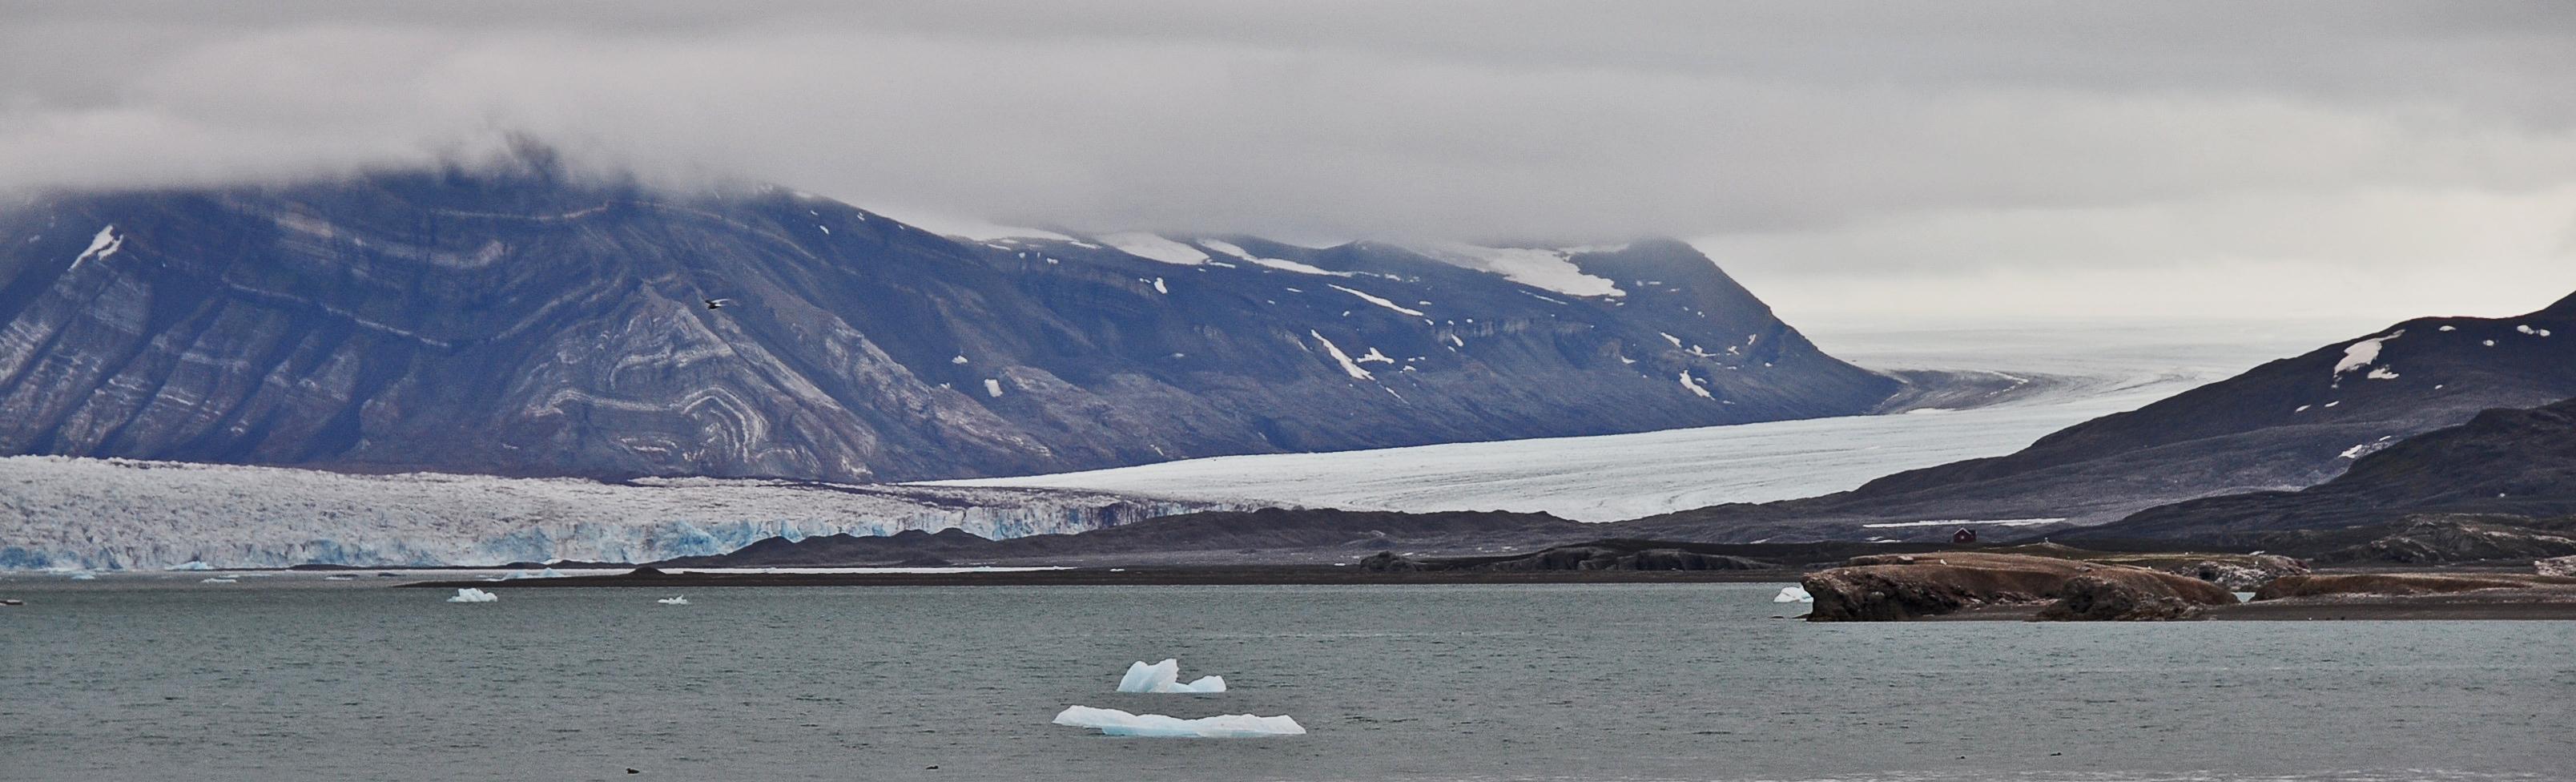 Glaciology in Ny-Ålesund